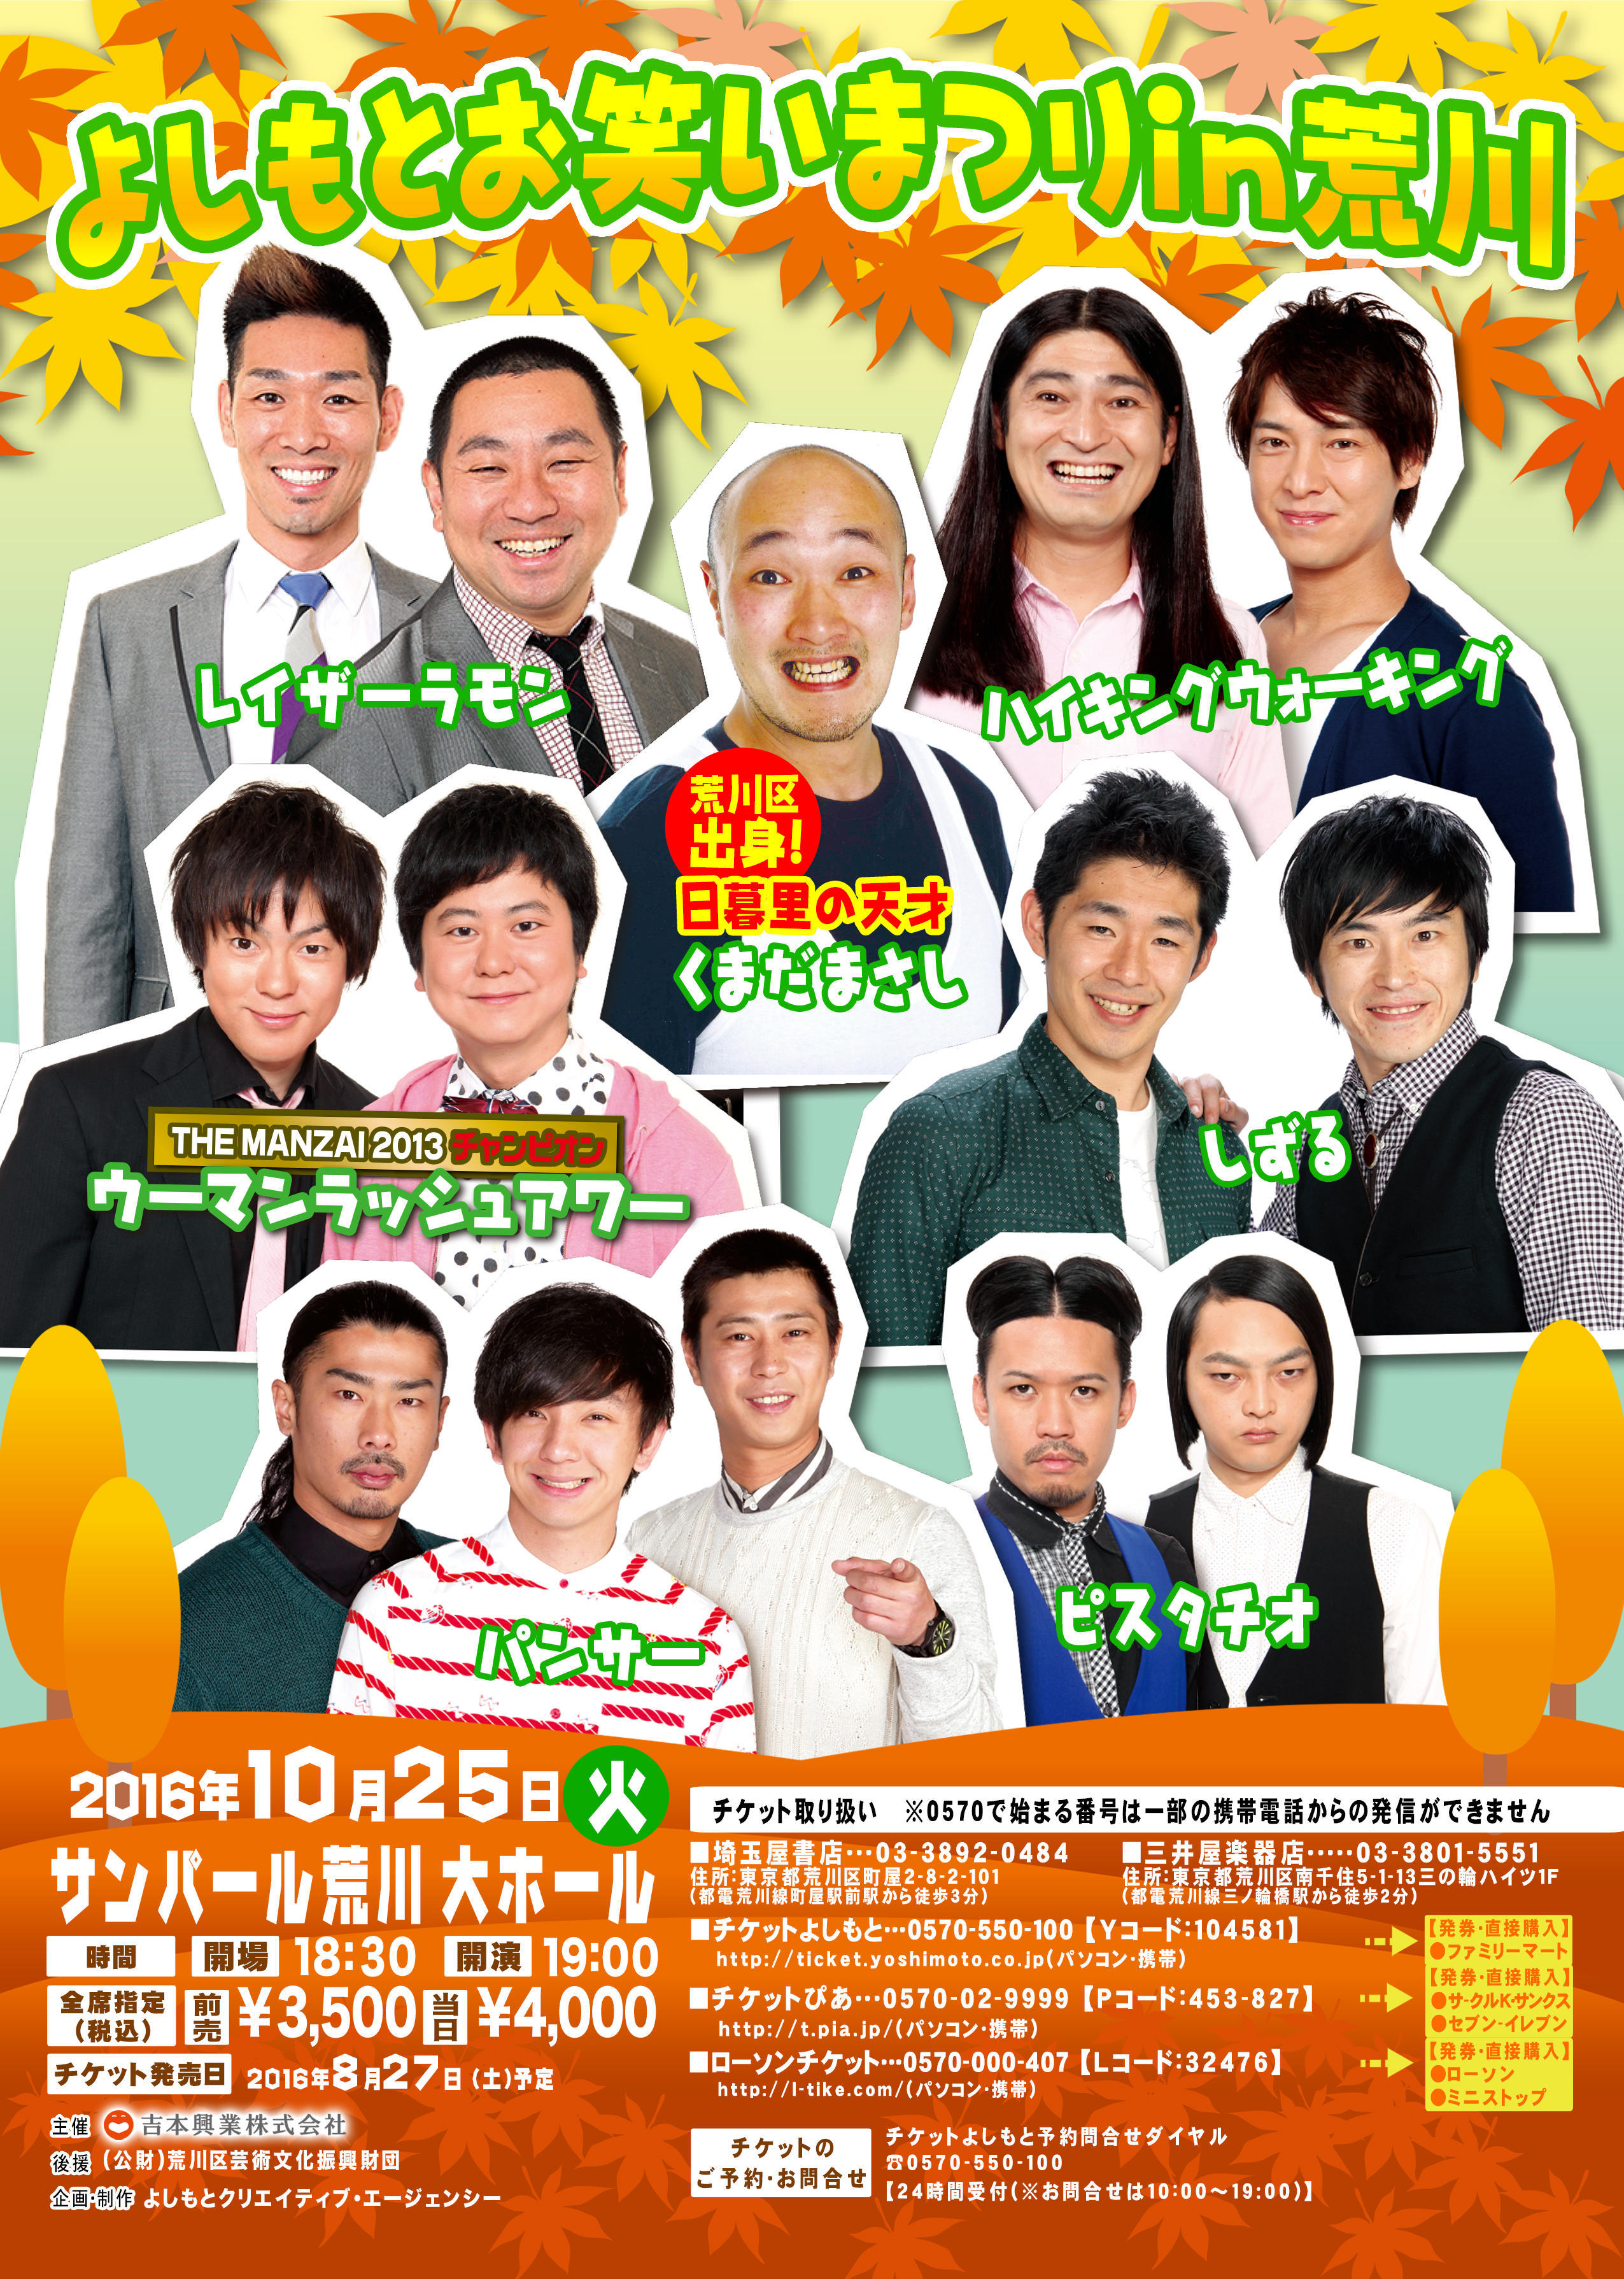 http://www.syumatsu.jp/20161002125706-be4d6481631b71019dc7531ddc1efa2f13f2039c.jpg